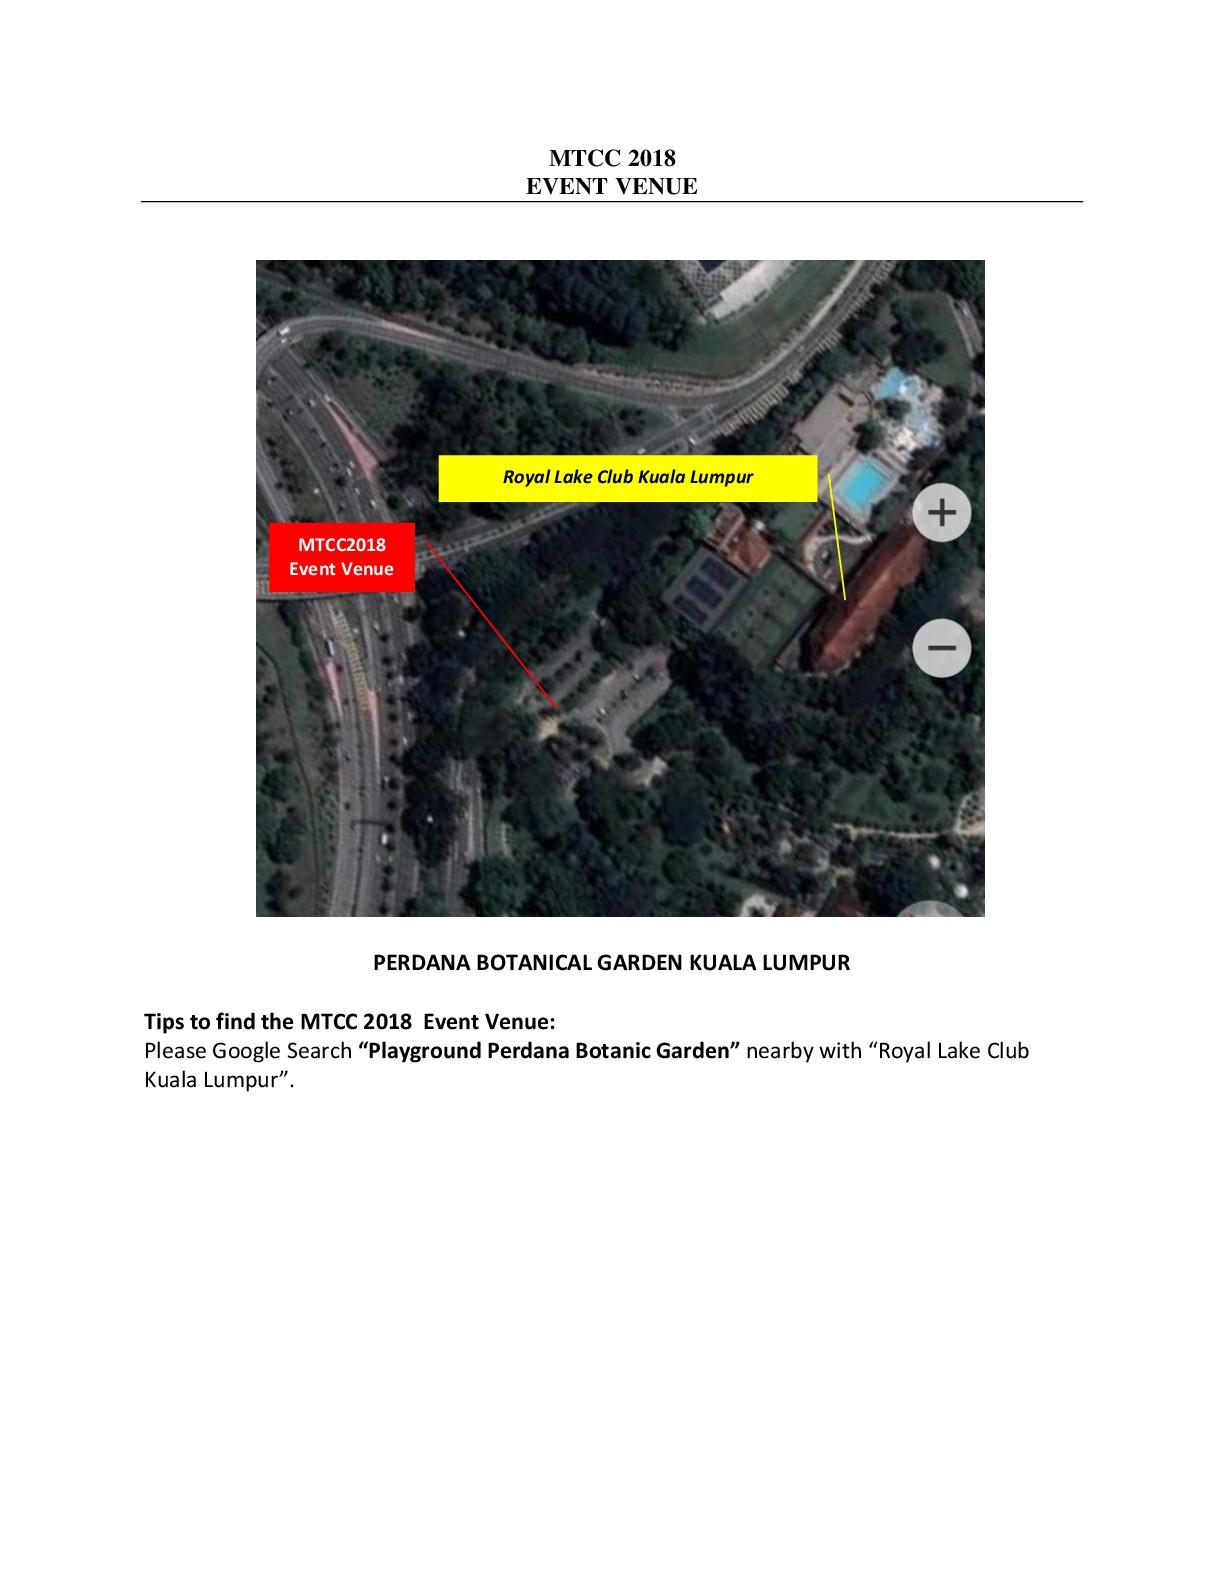 MTCC2018-COMPETITOR-INFORMATION-KIT-002